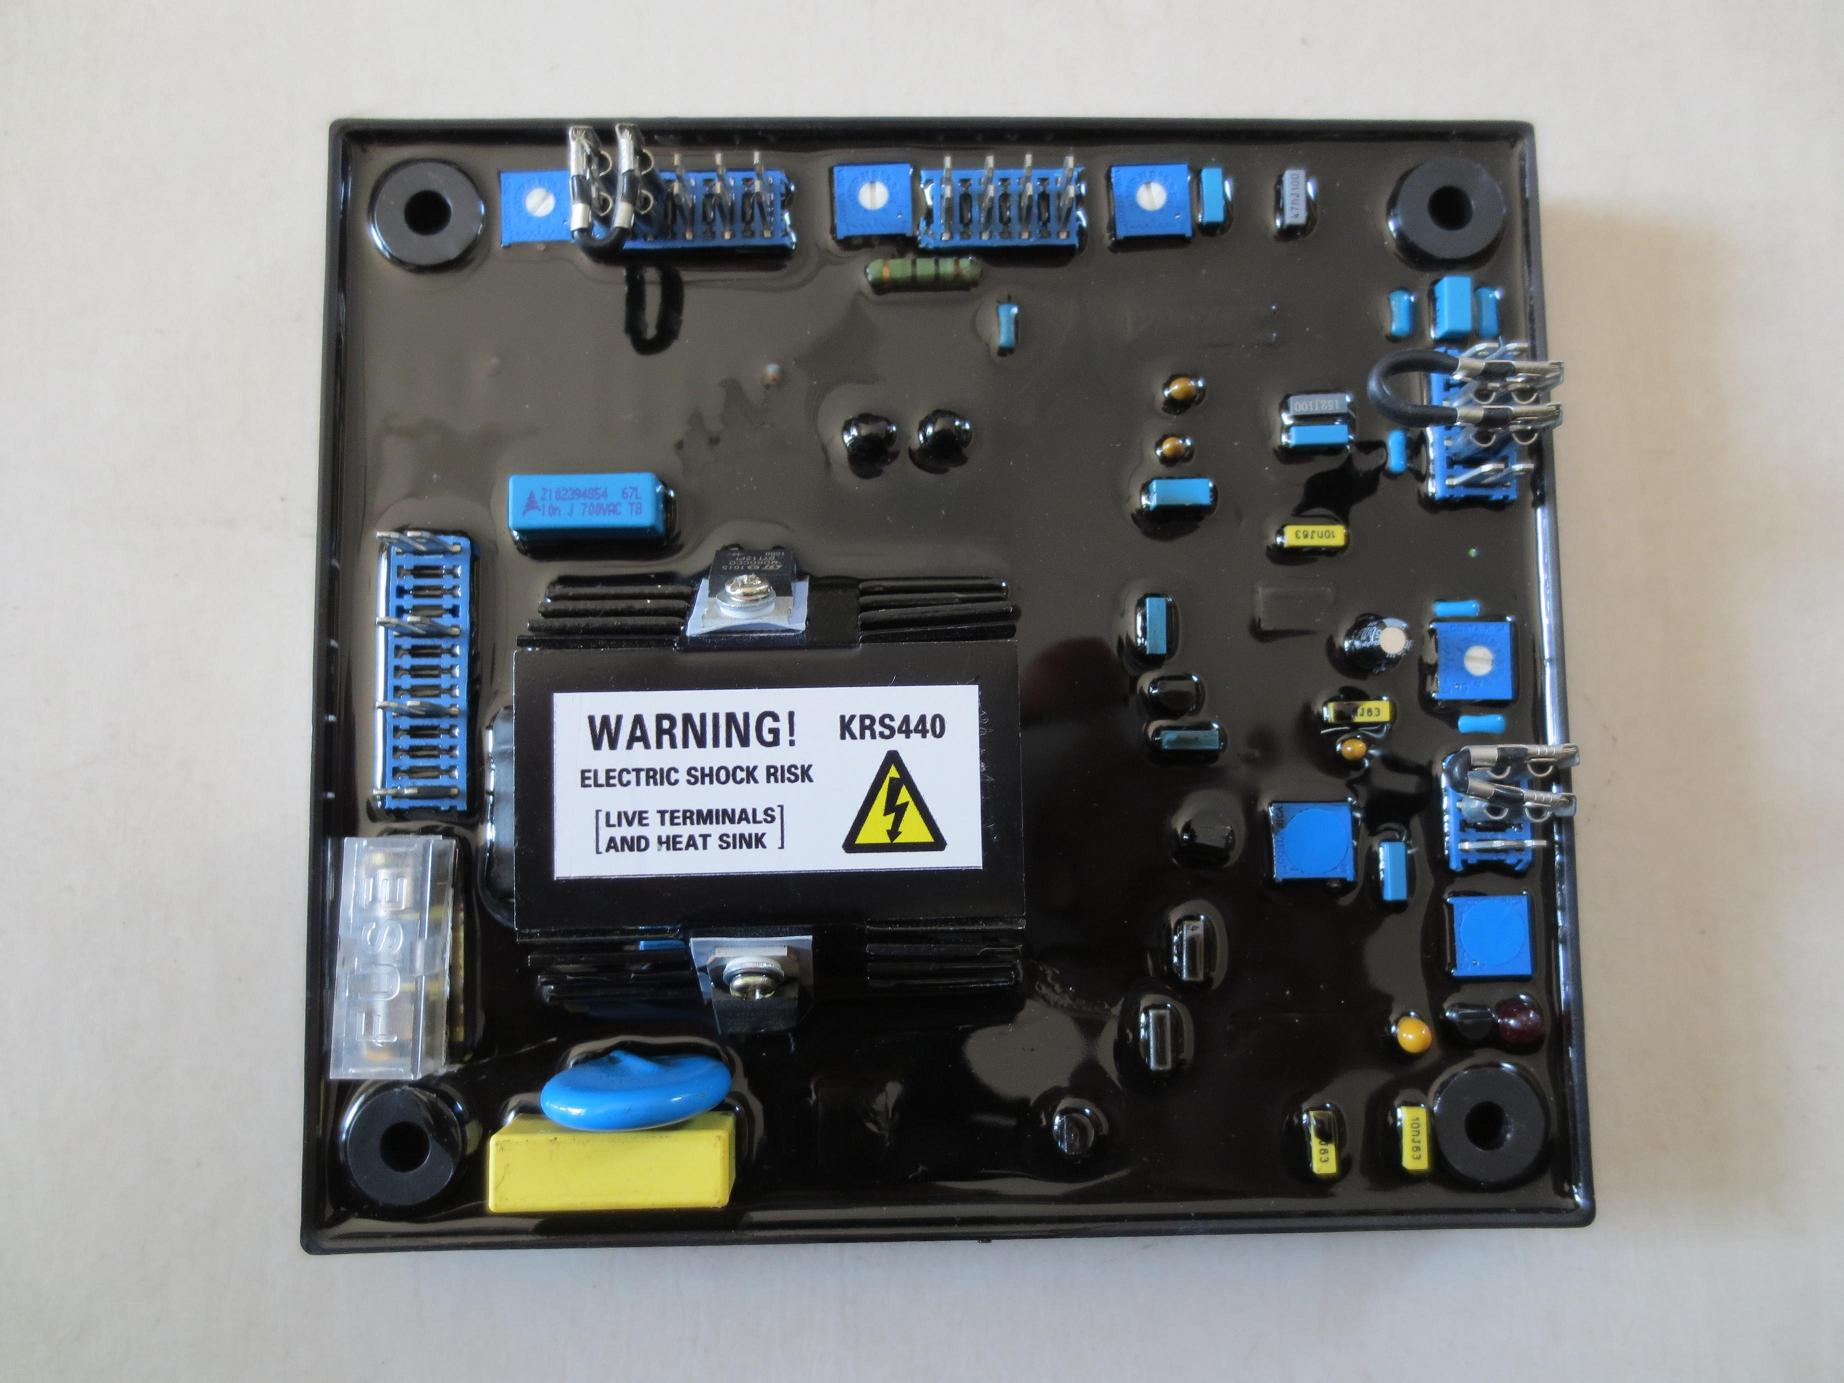 KRS440 automatic voltage regulator (AVR)KRS440 automatic voltage regulator (AVR)